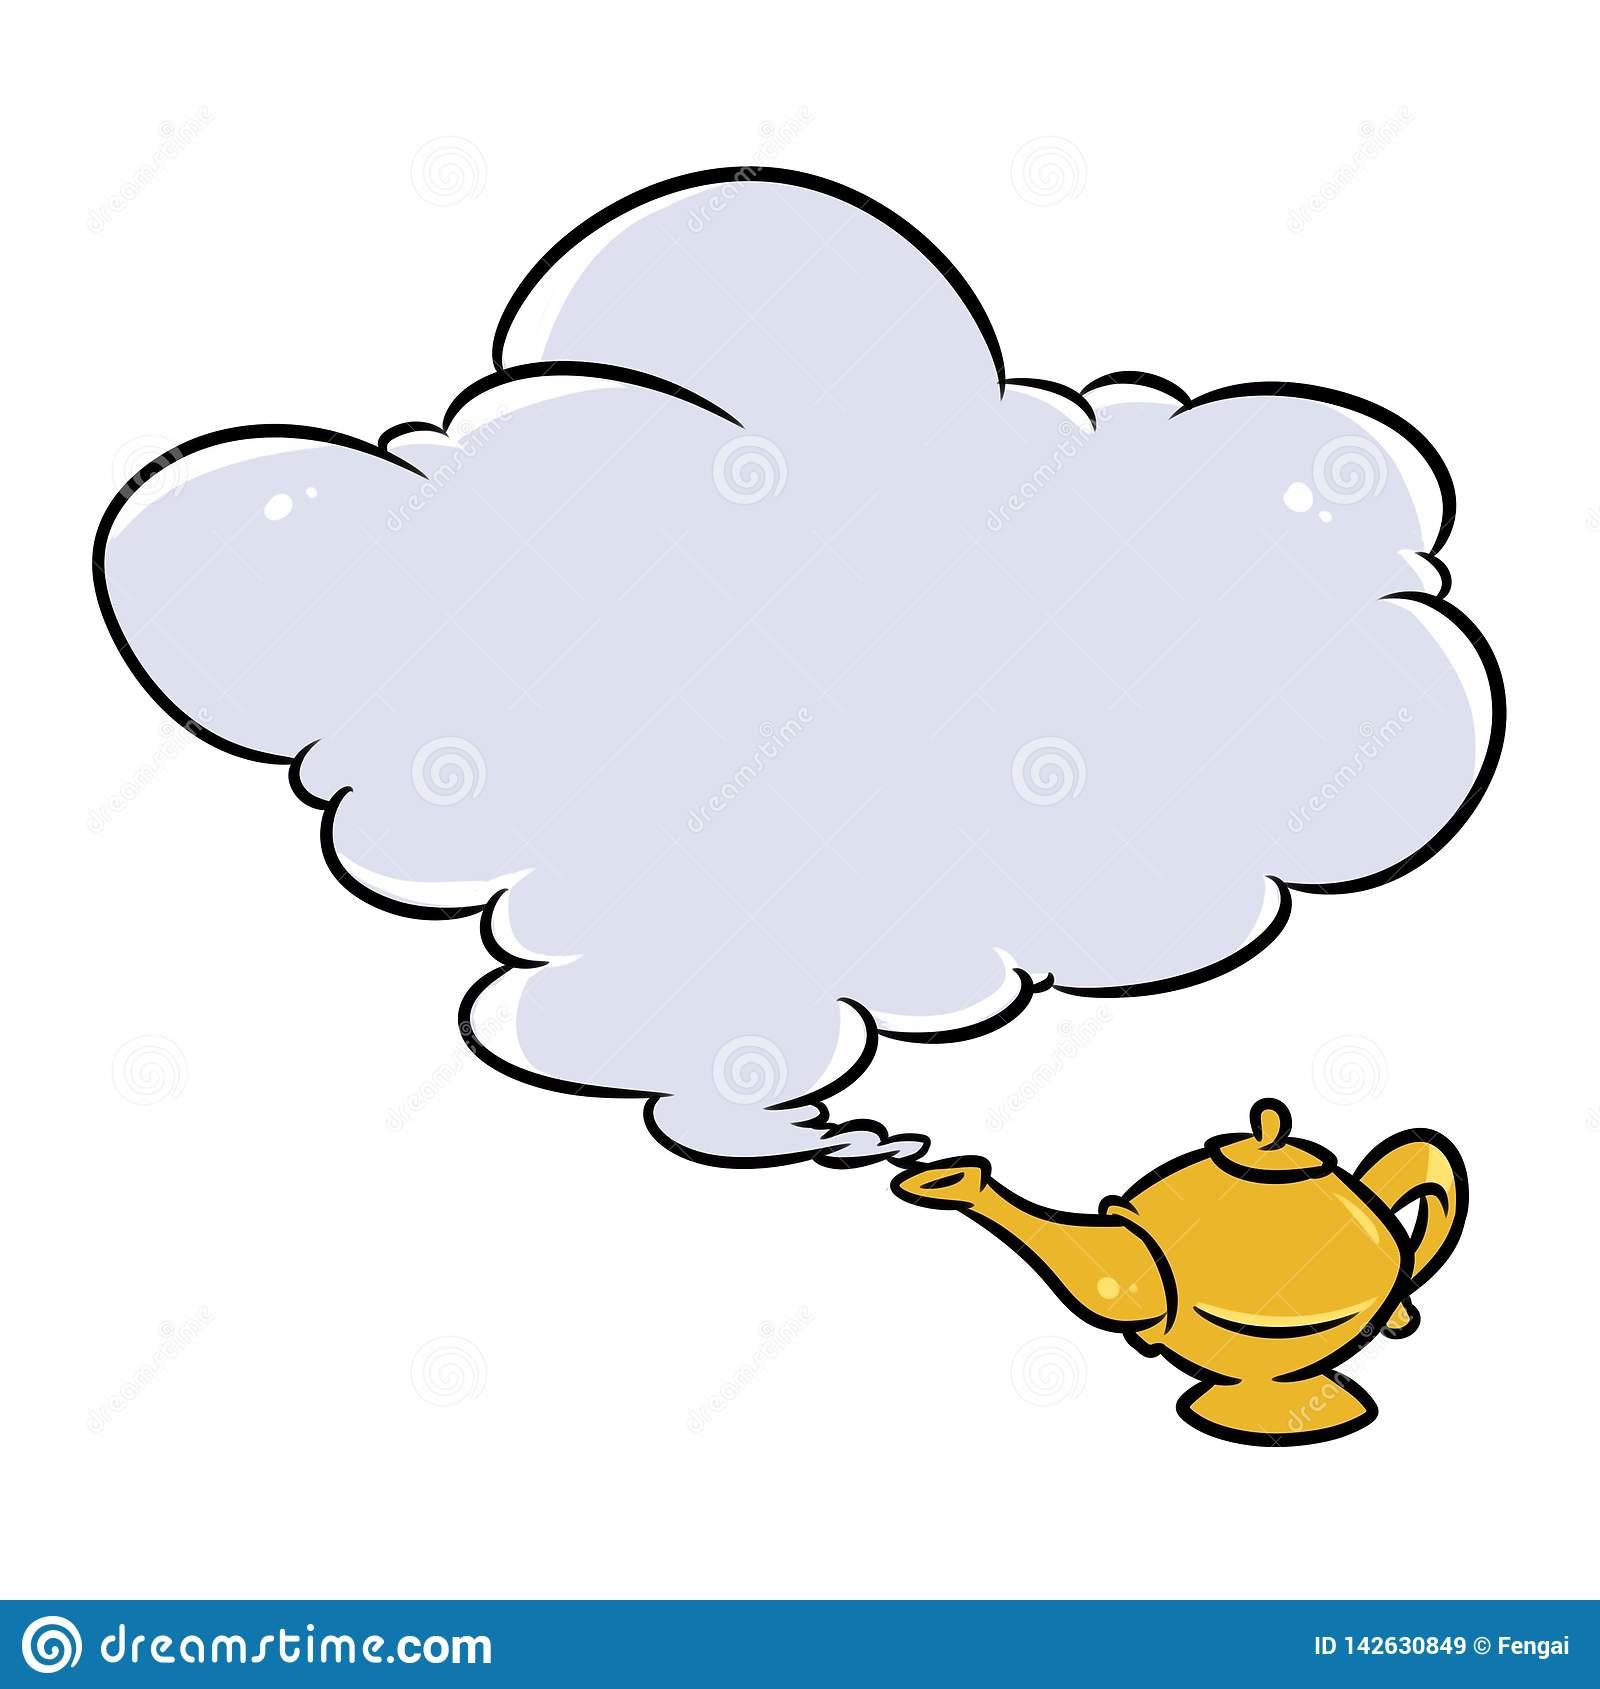 Aladdin Magic Lamp Jin Cloud Cartoon Stock Illustration.